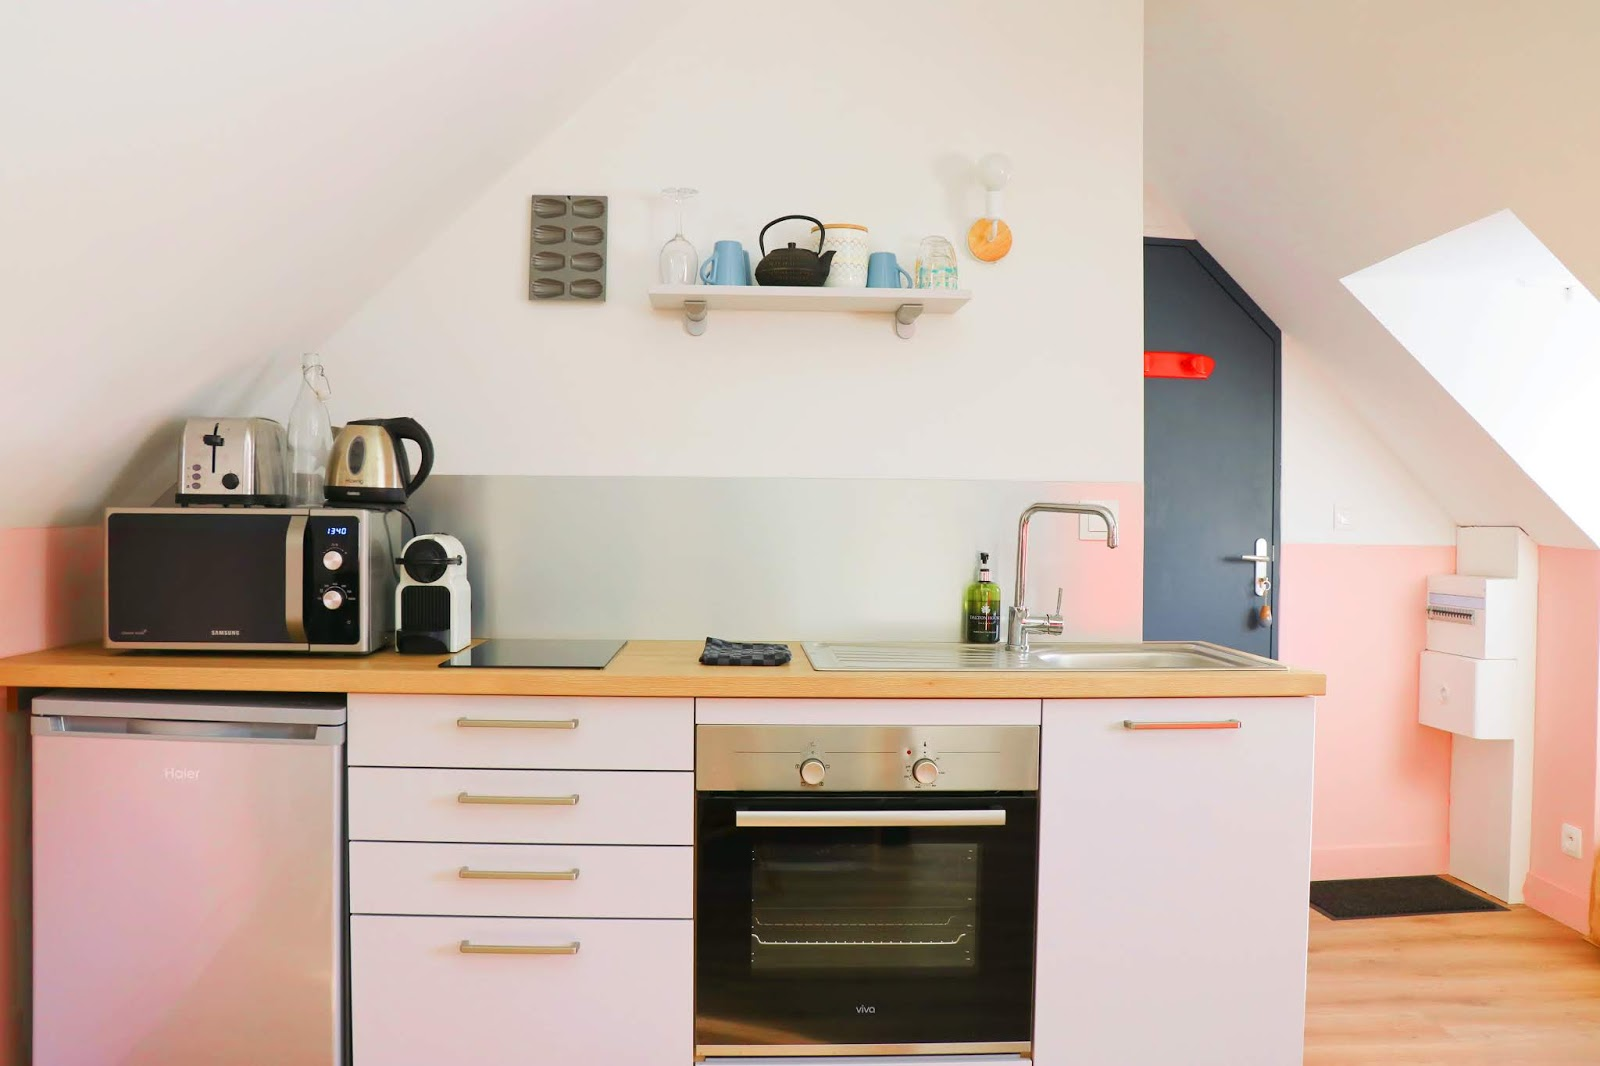 gite les madeleines carolles avis vacances normandie granville airbnb babymoon couple